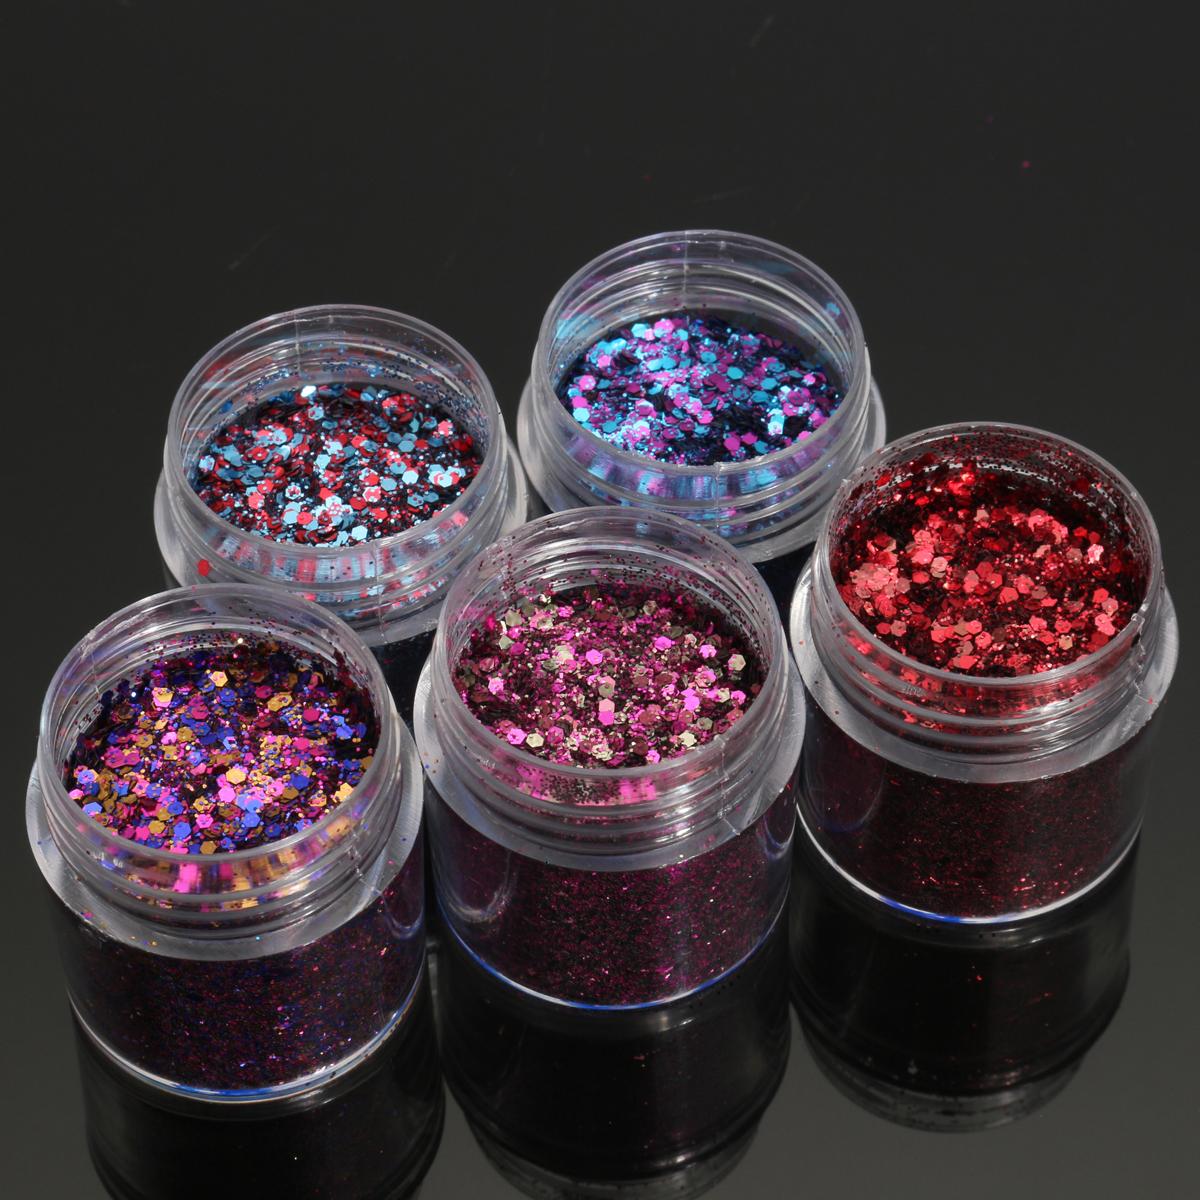 Shining Mixed Glitter Powder Sequins Decoration 3D Dust ...